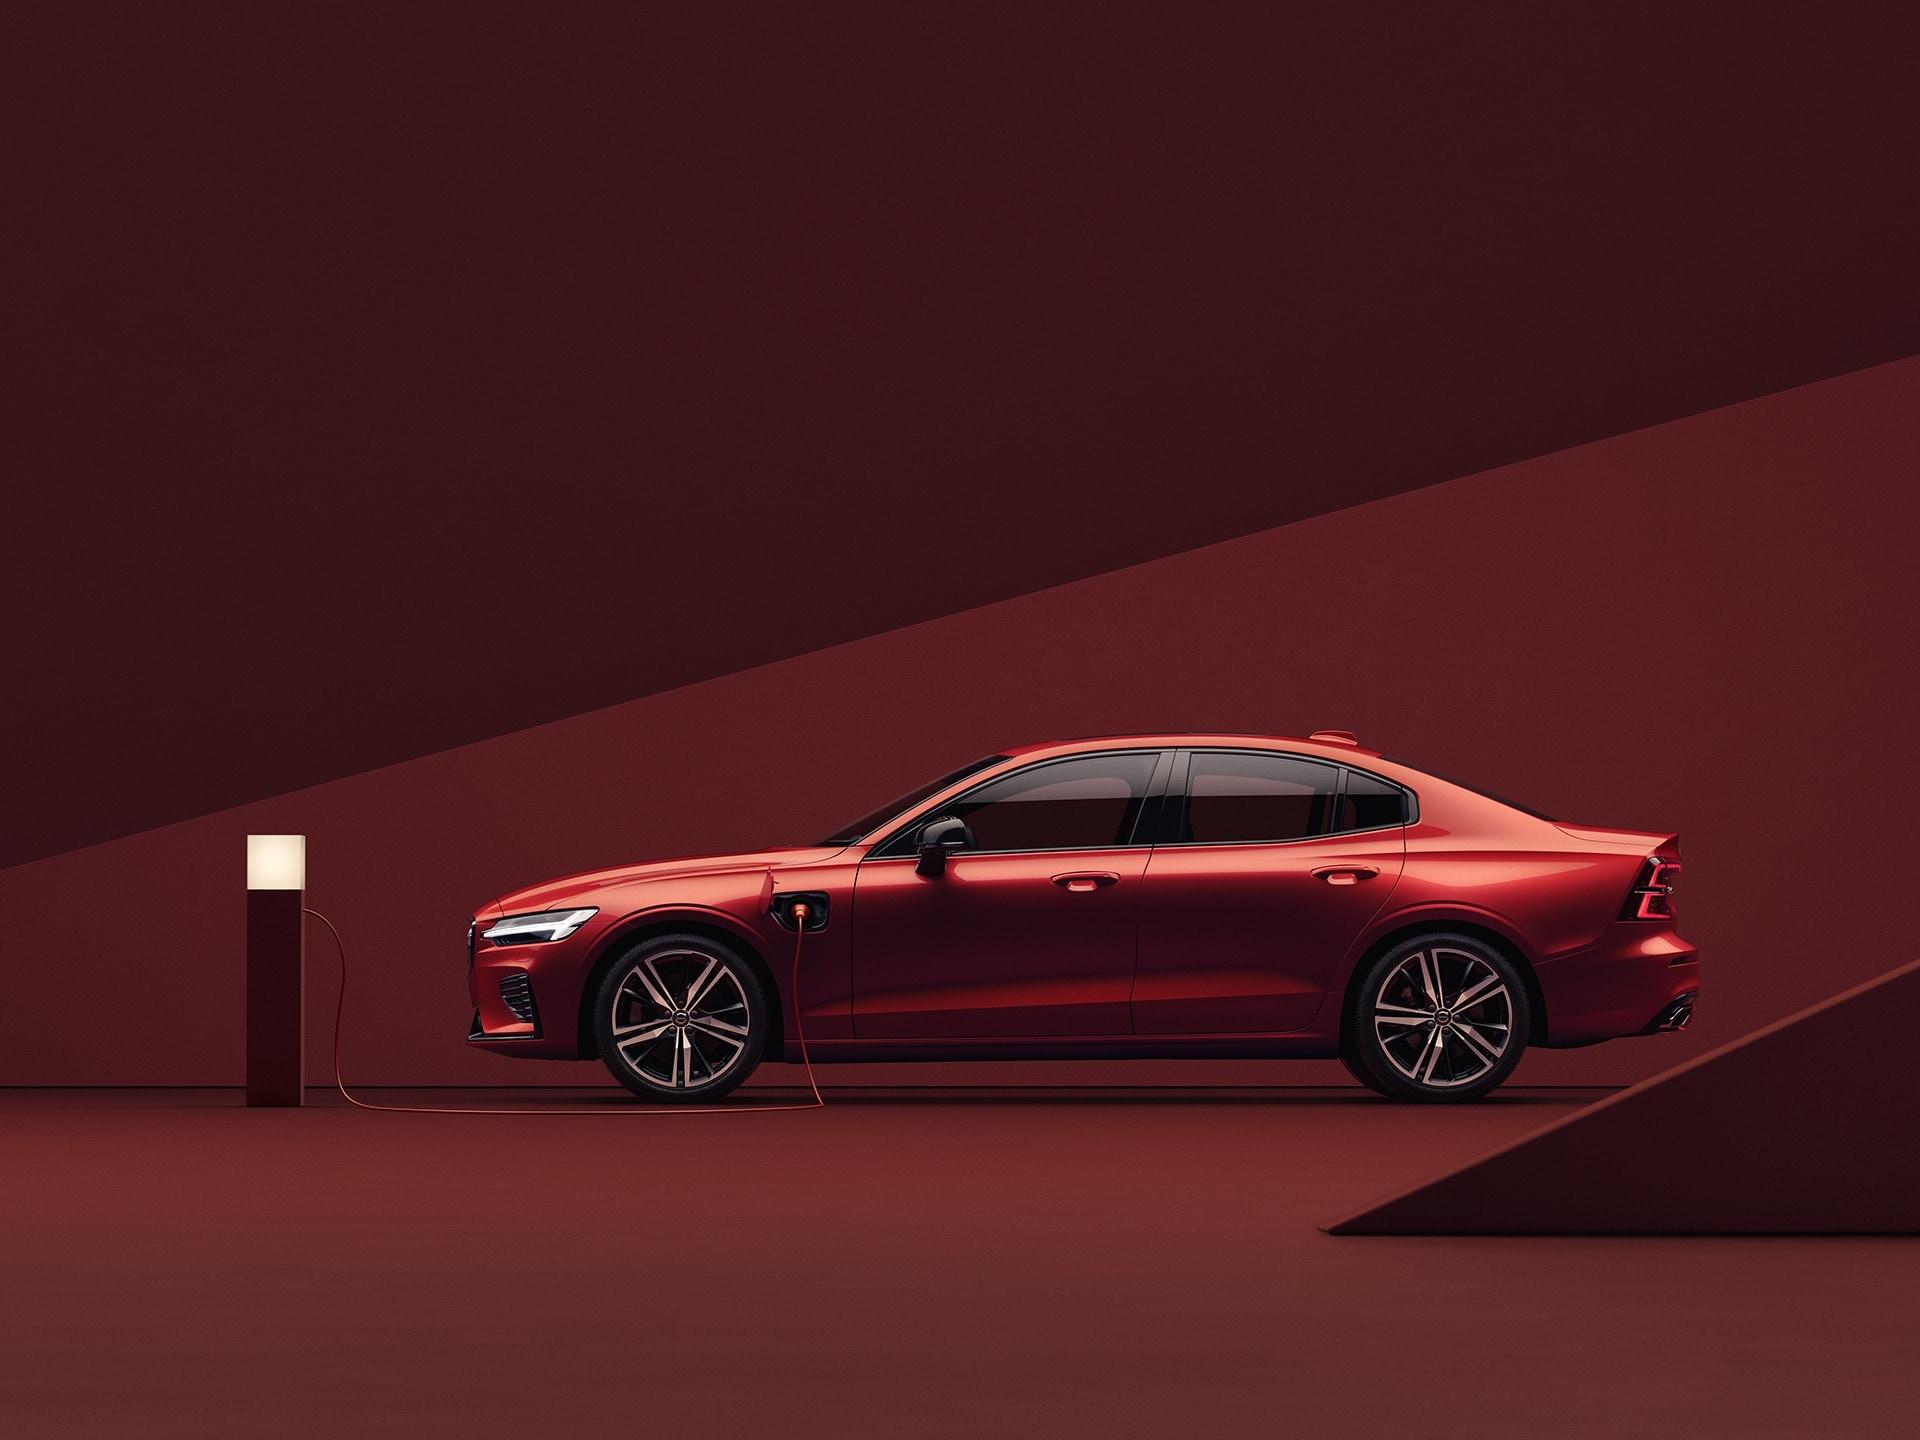 S60 RECHARGE红车图,在红色背景中充电